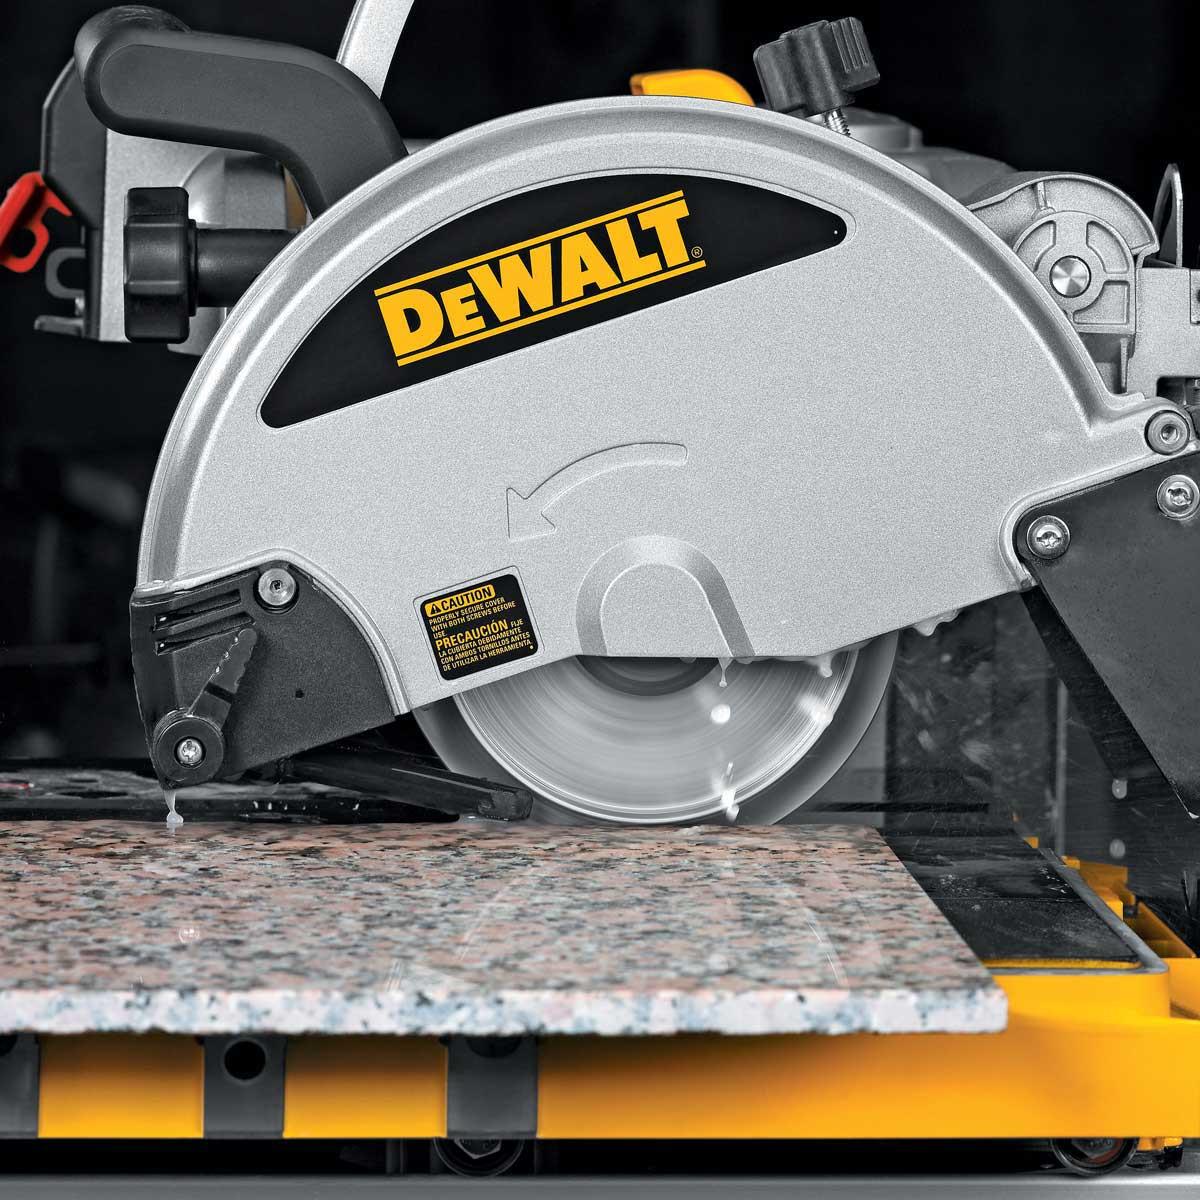 Dewalt D24000 with marble profile wheel